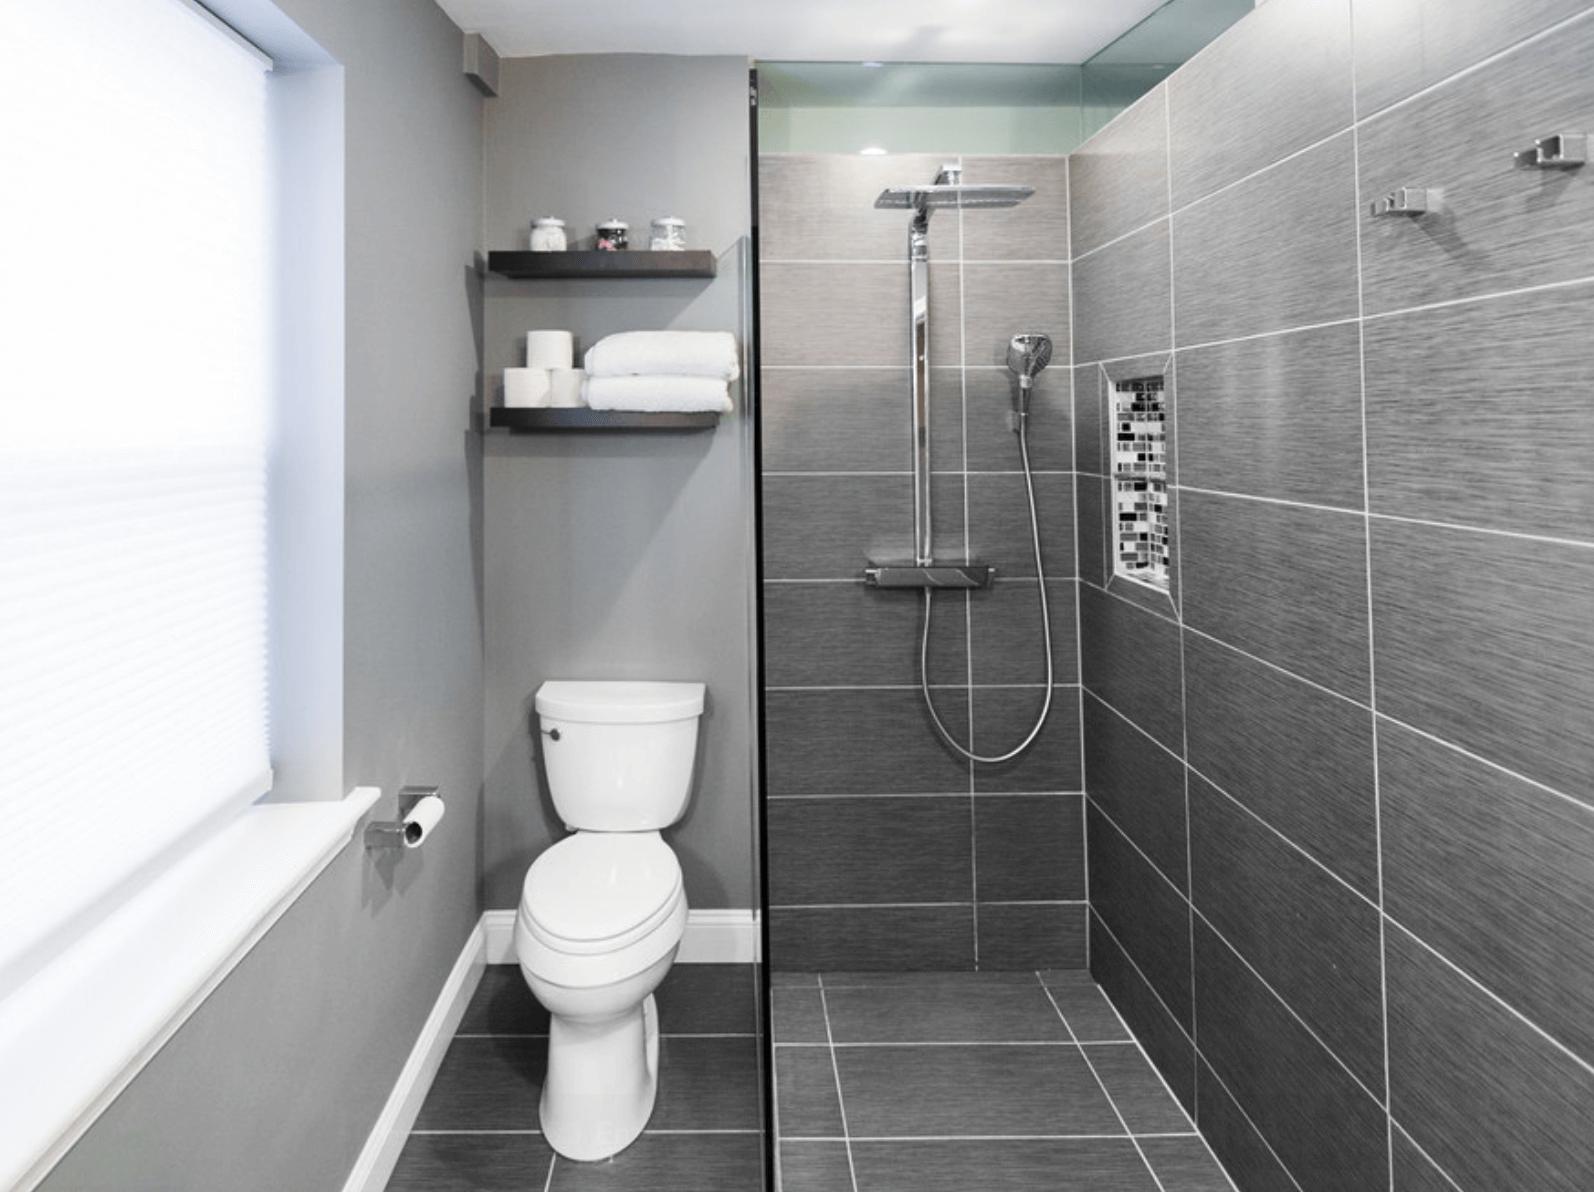 banheiro pequeno layout #5E6D61 1594 1192